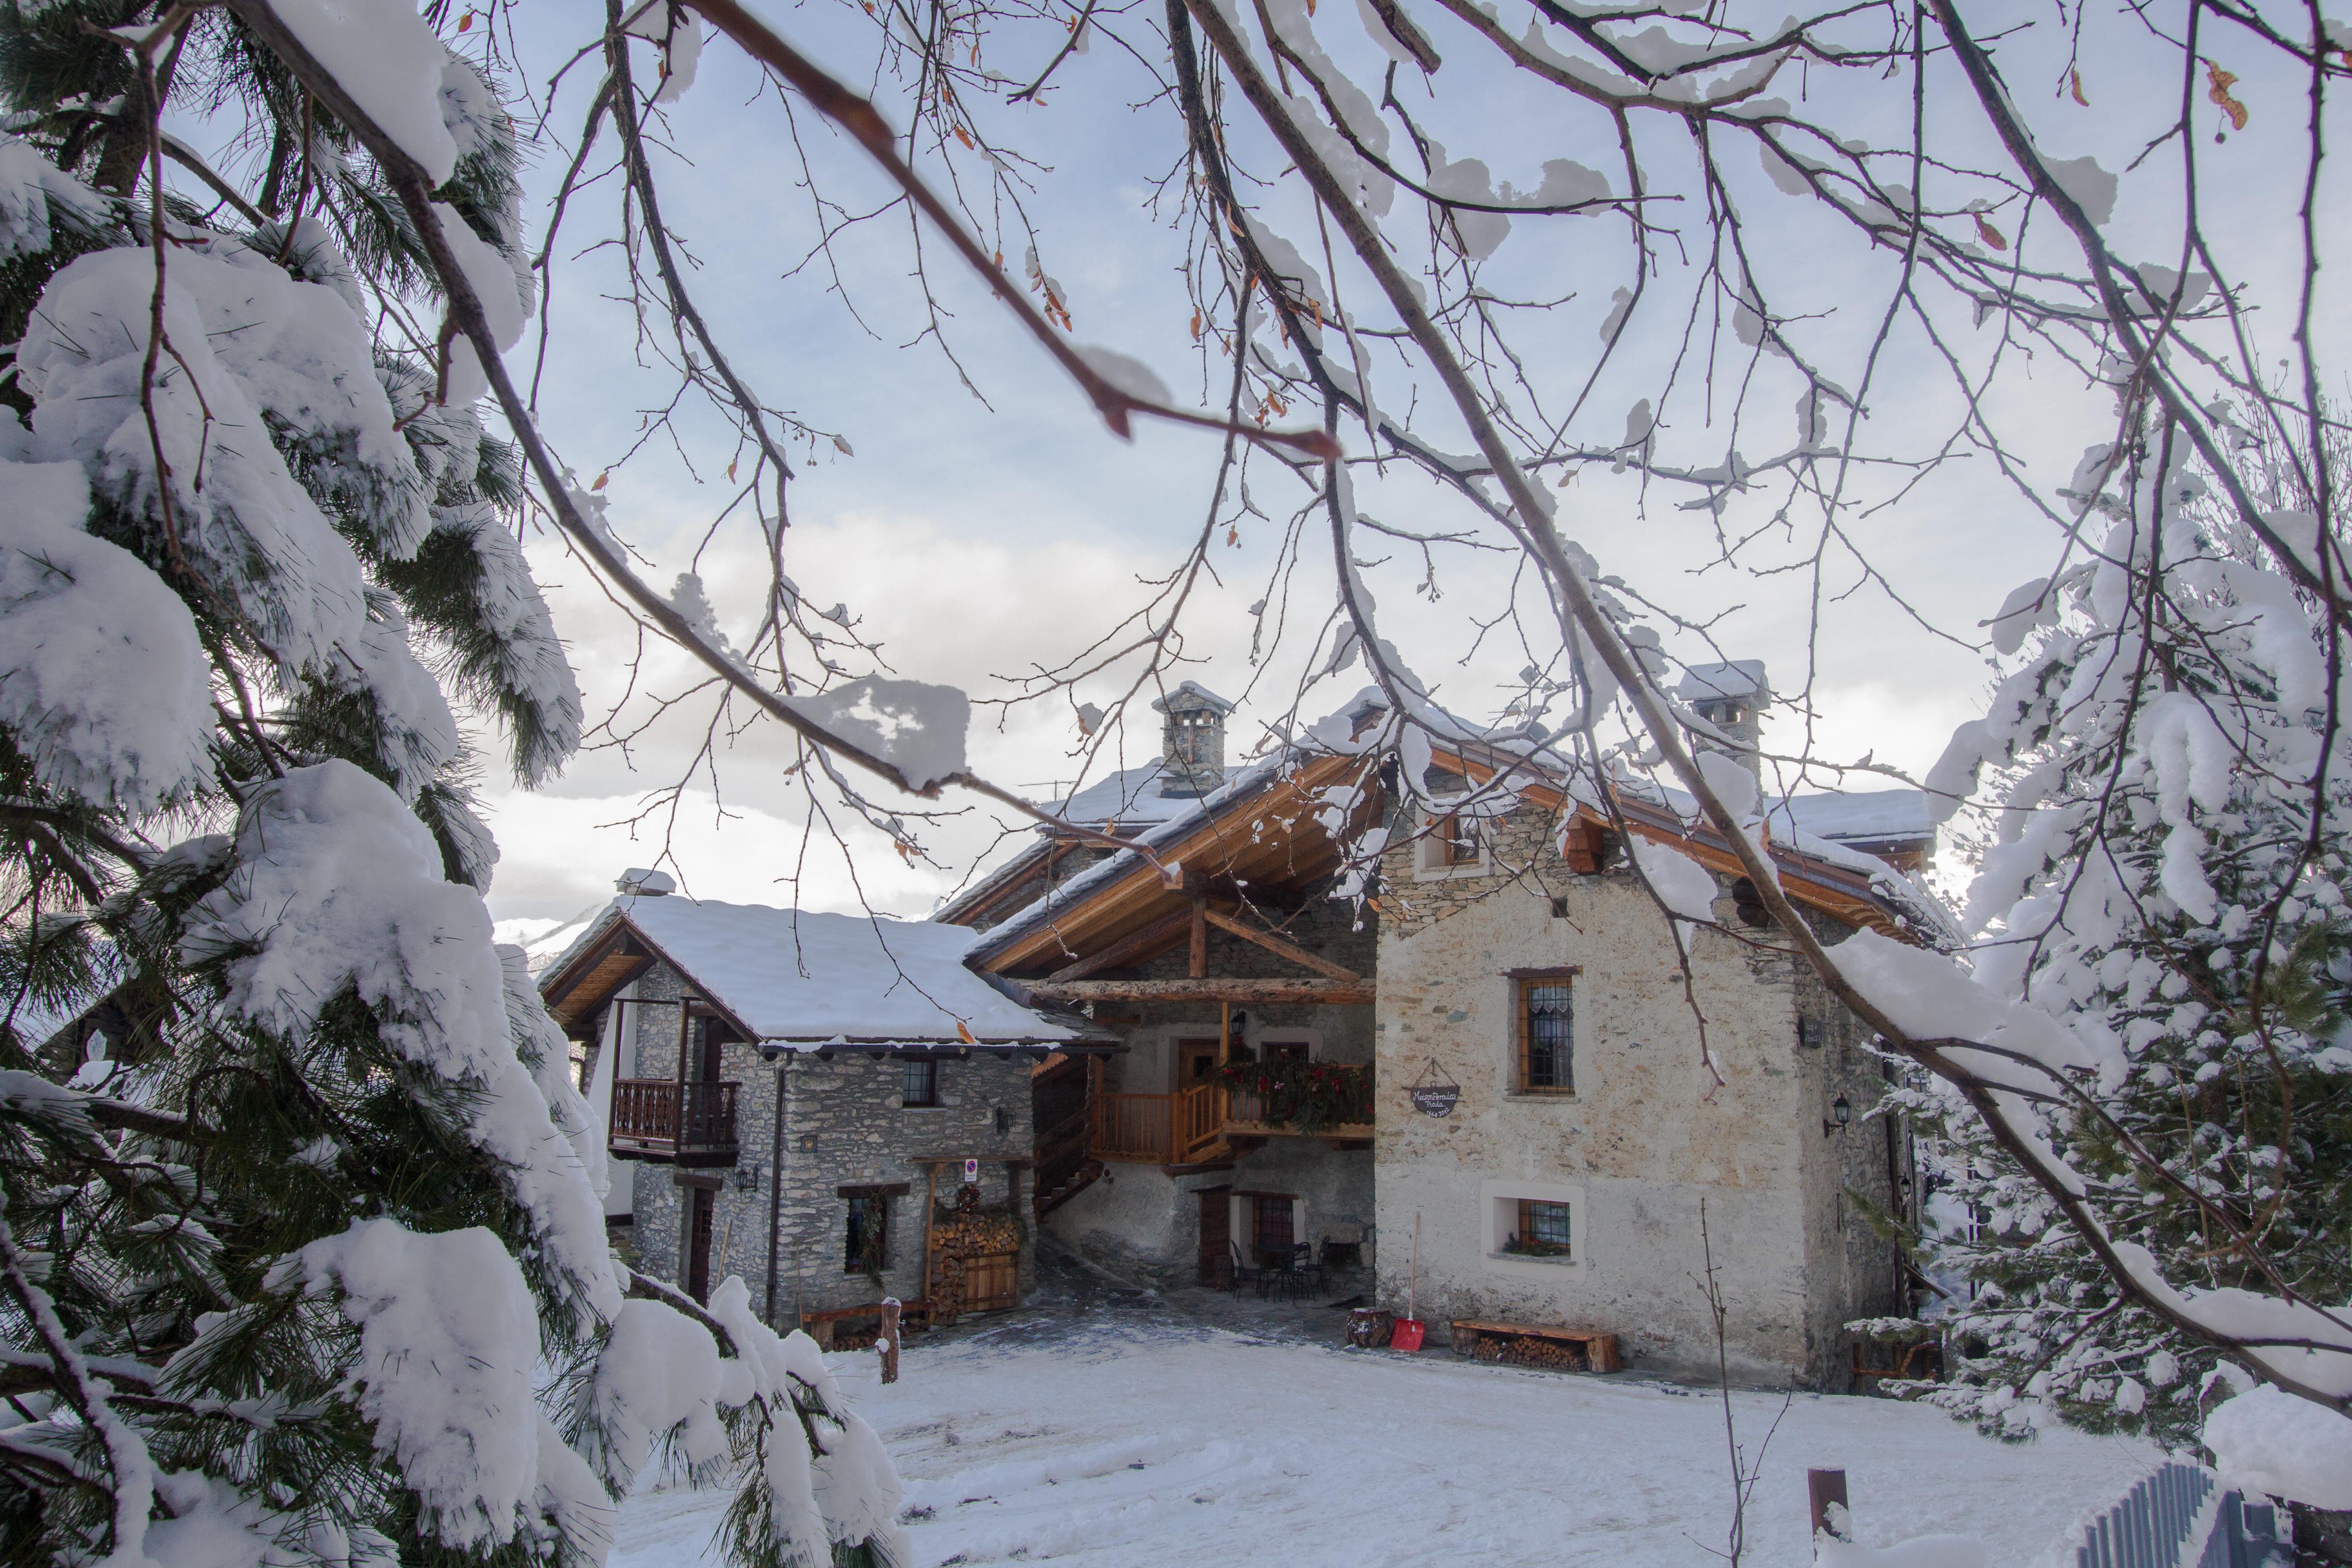 Maison Peroulaz